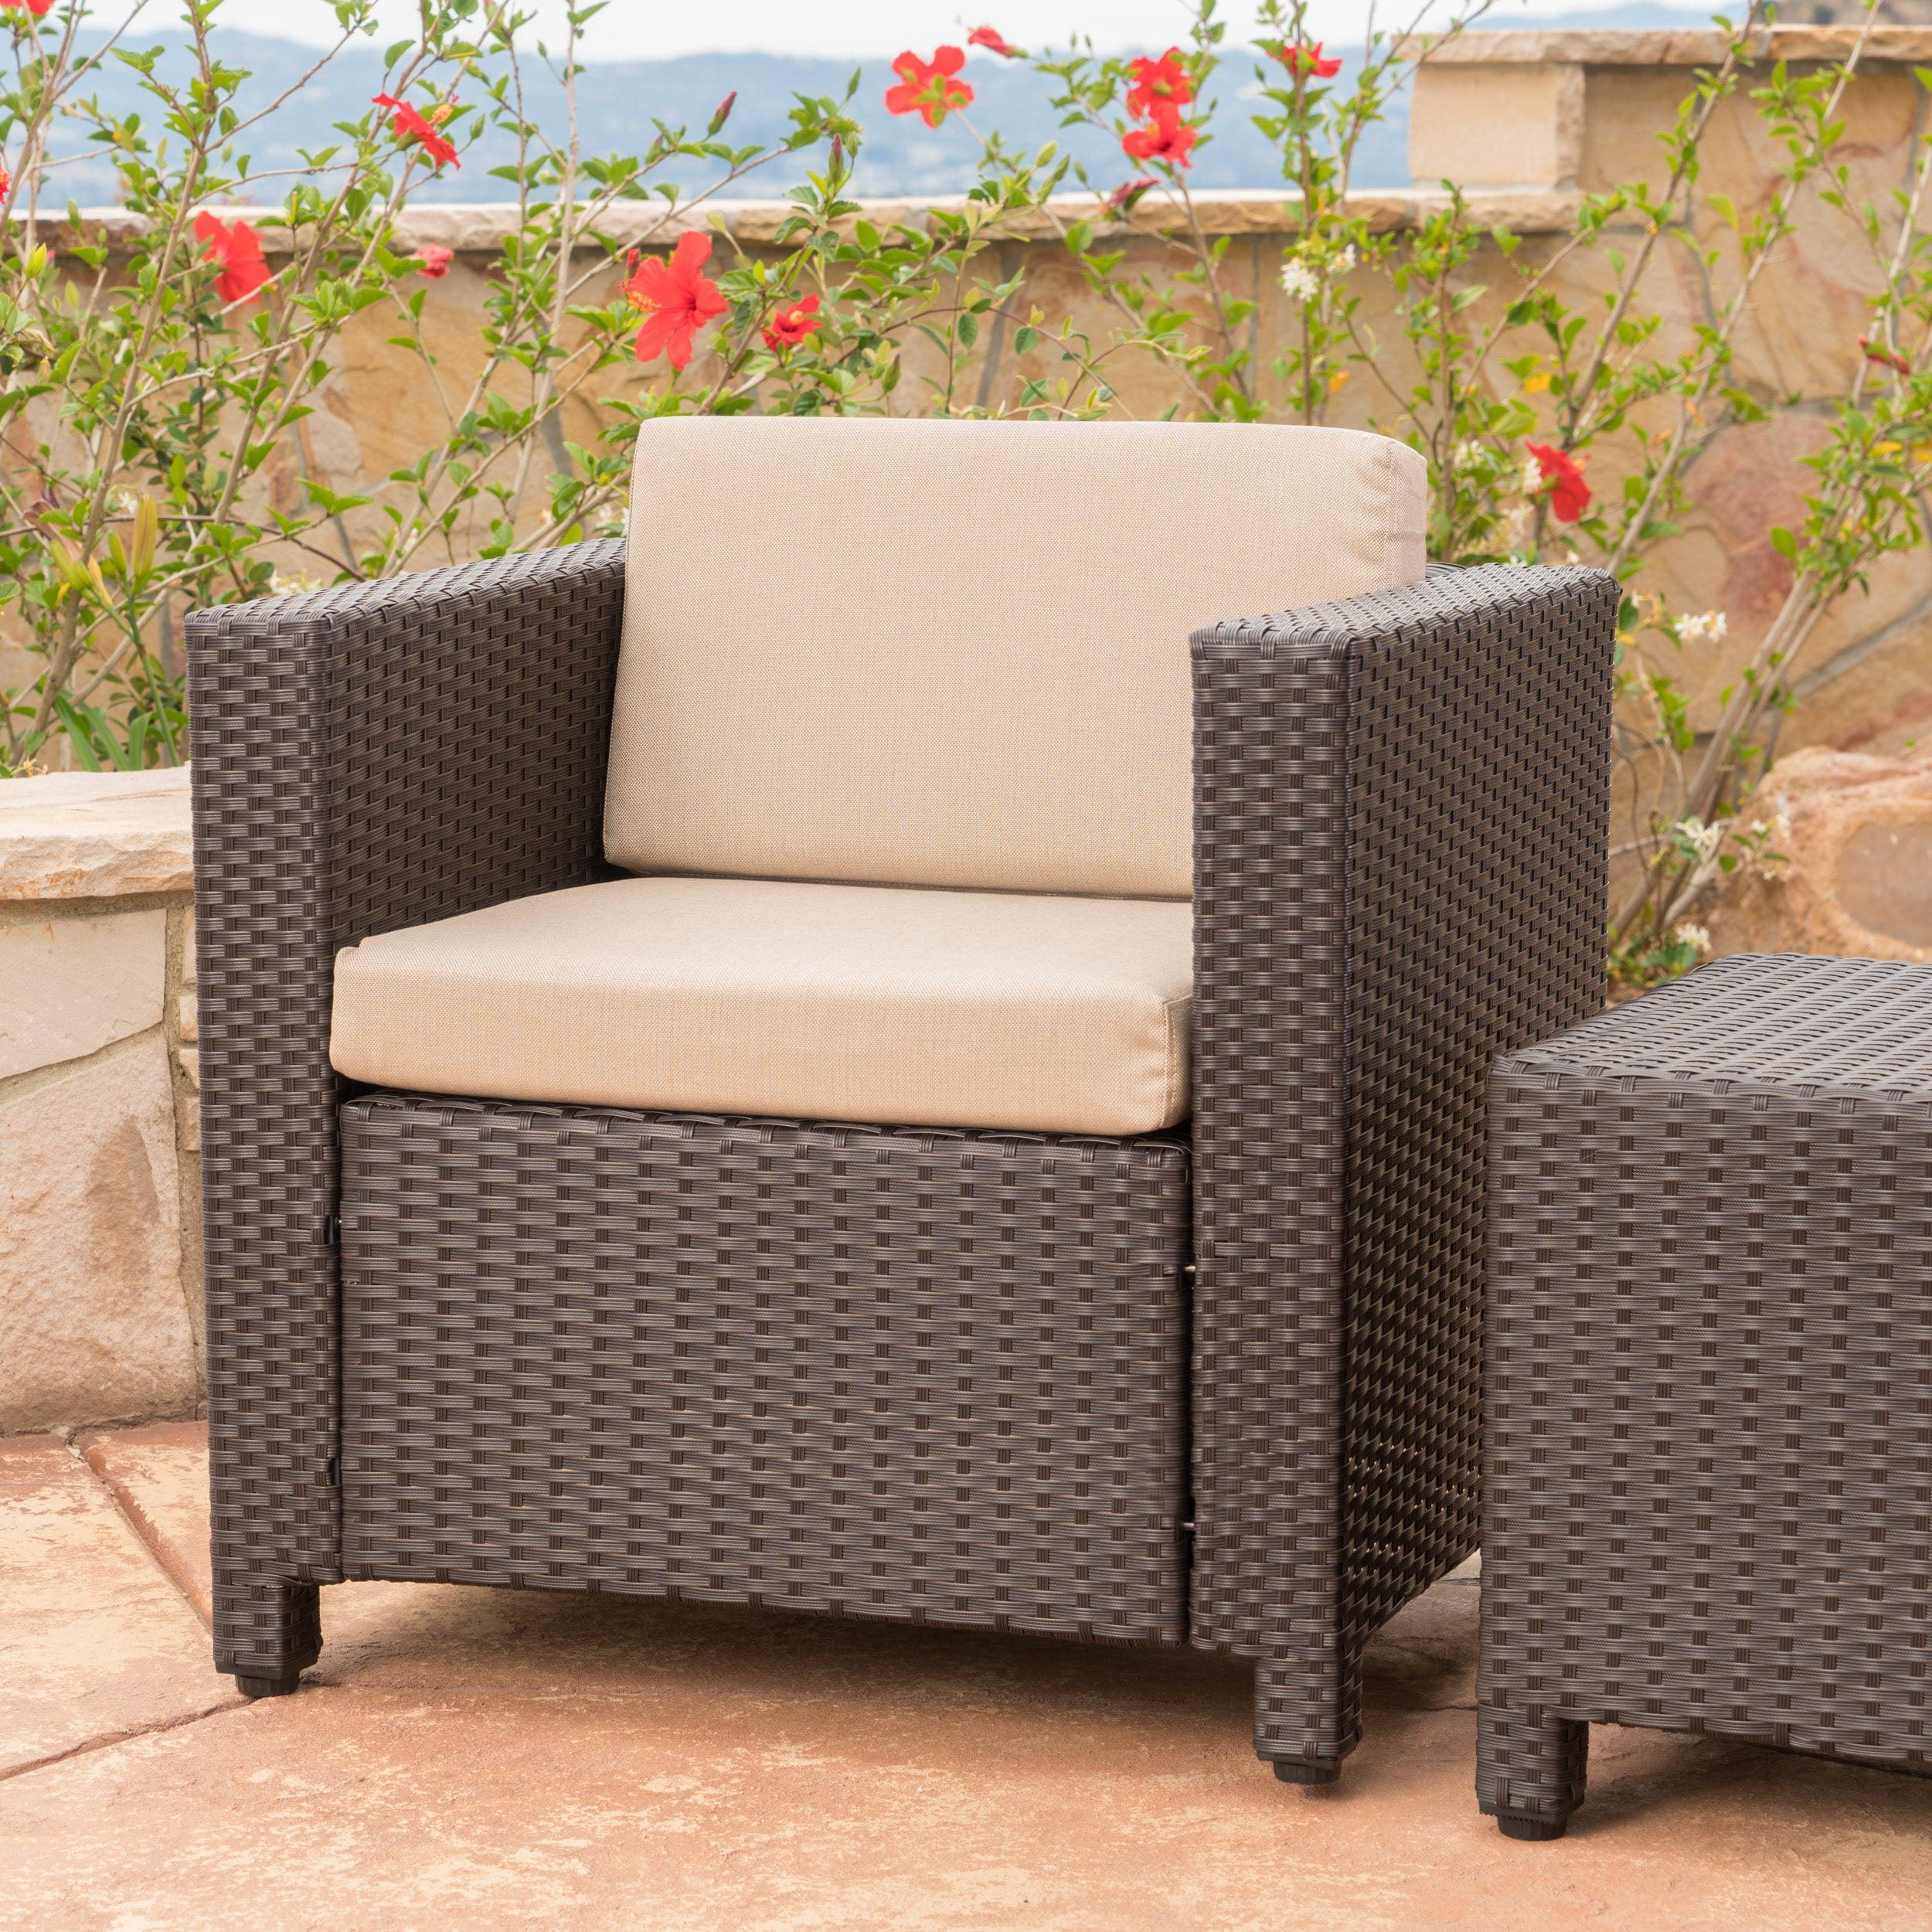 Cascada Outdoor Wicker Club Chair with Cushions, Dark Brown, Beige